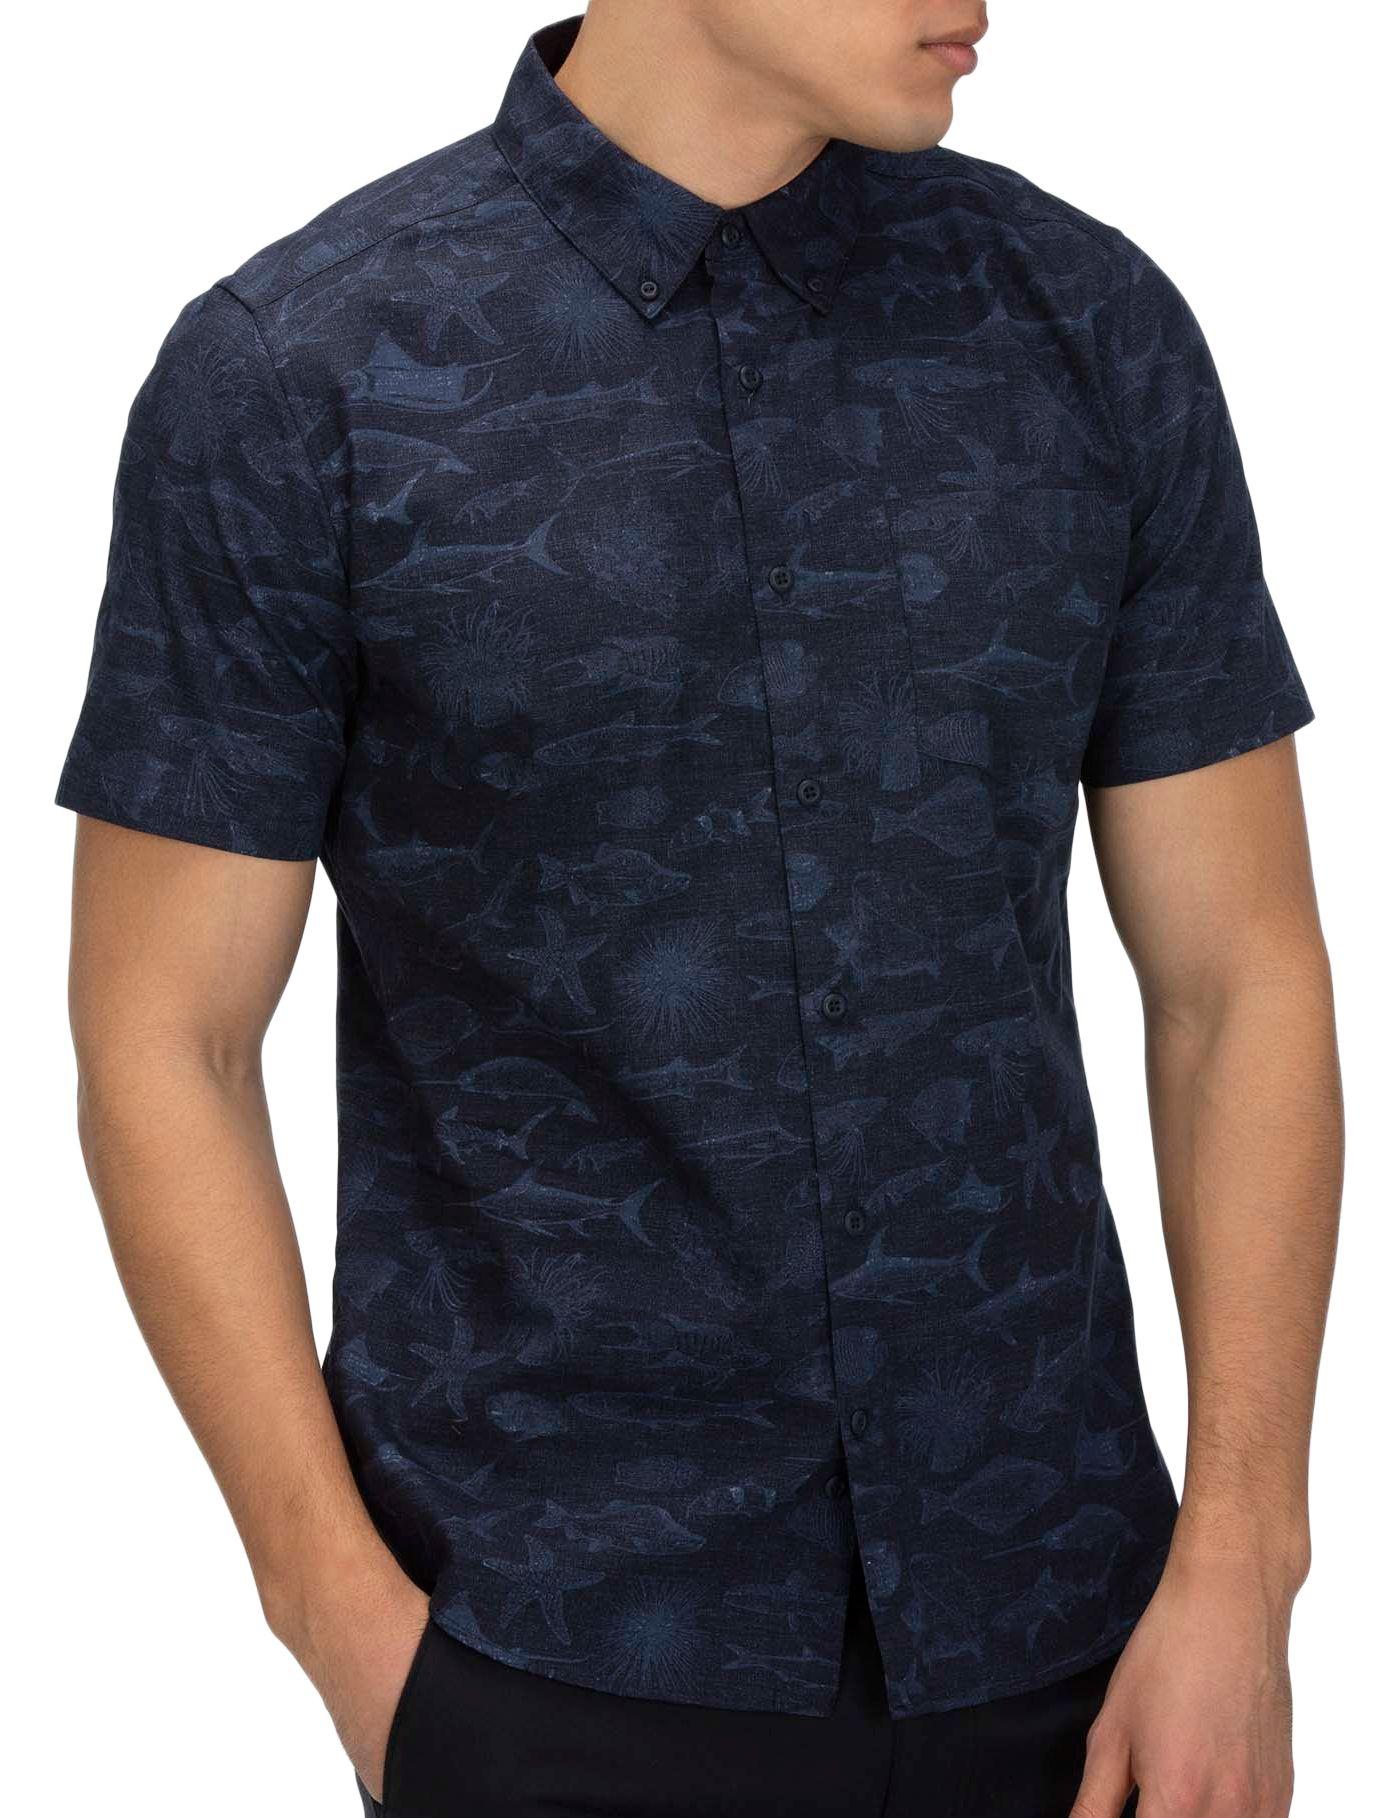 Hurley Men's Gone Fishin Short Sleeve Button Down Shirt